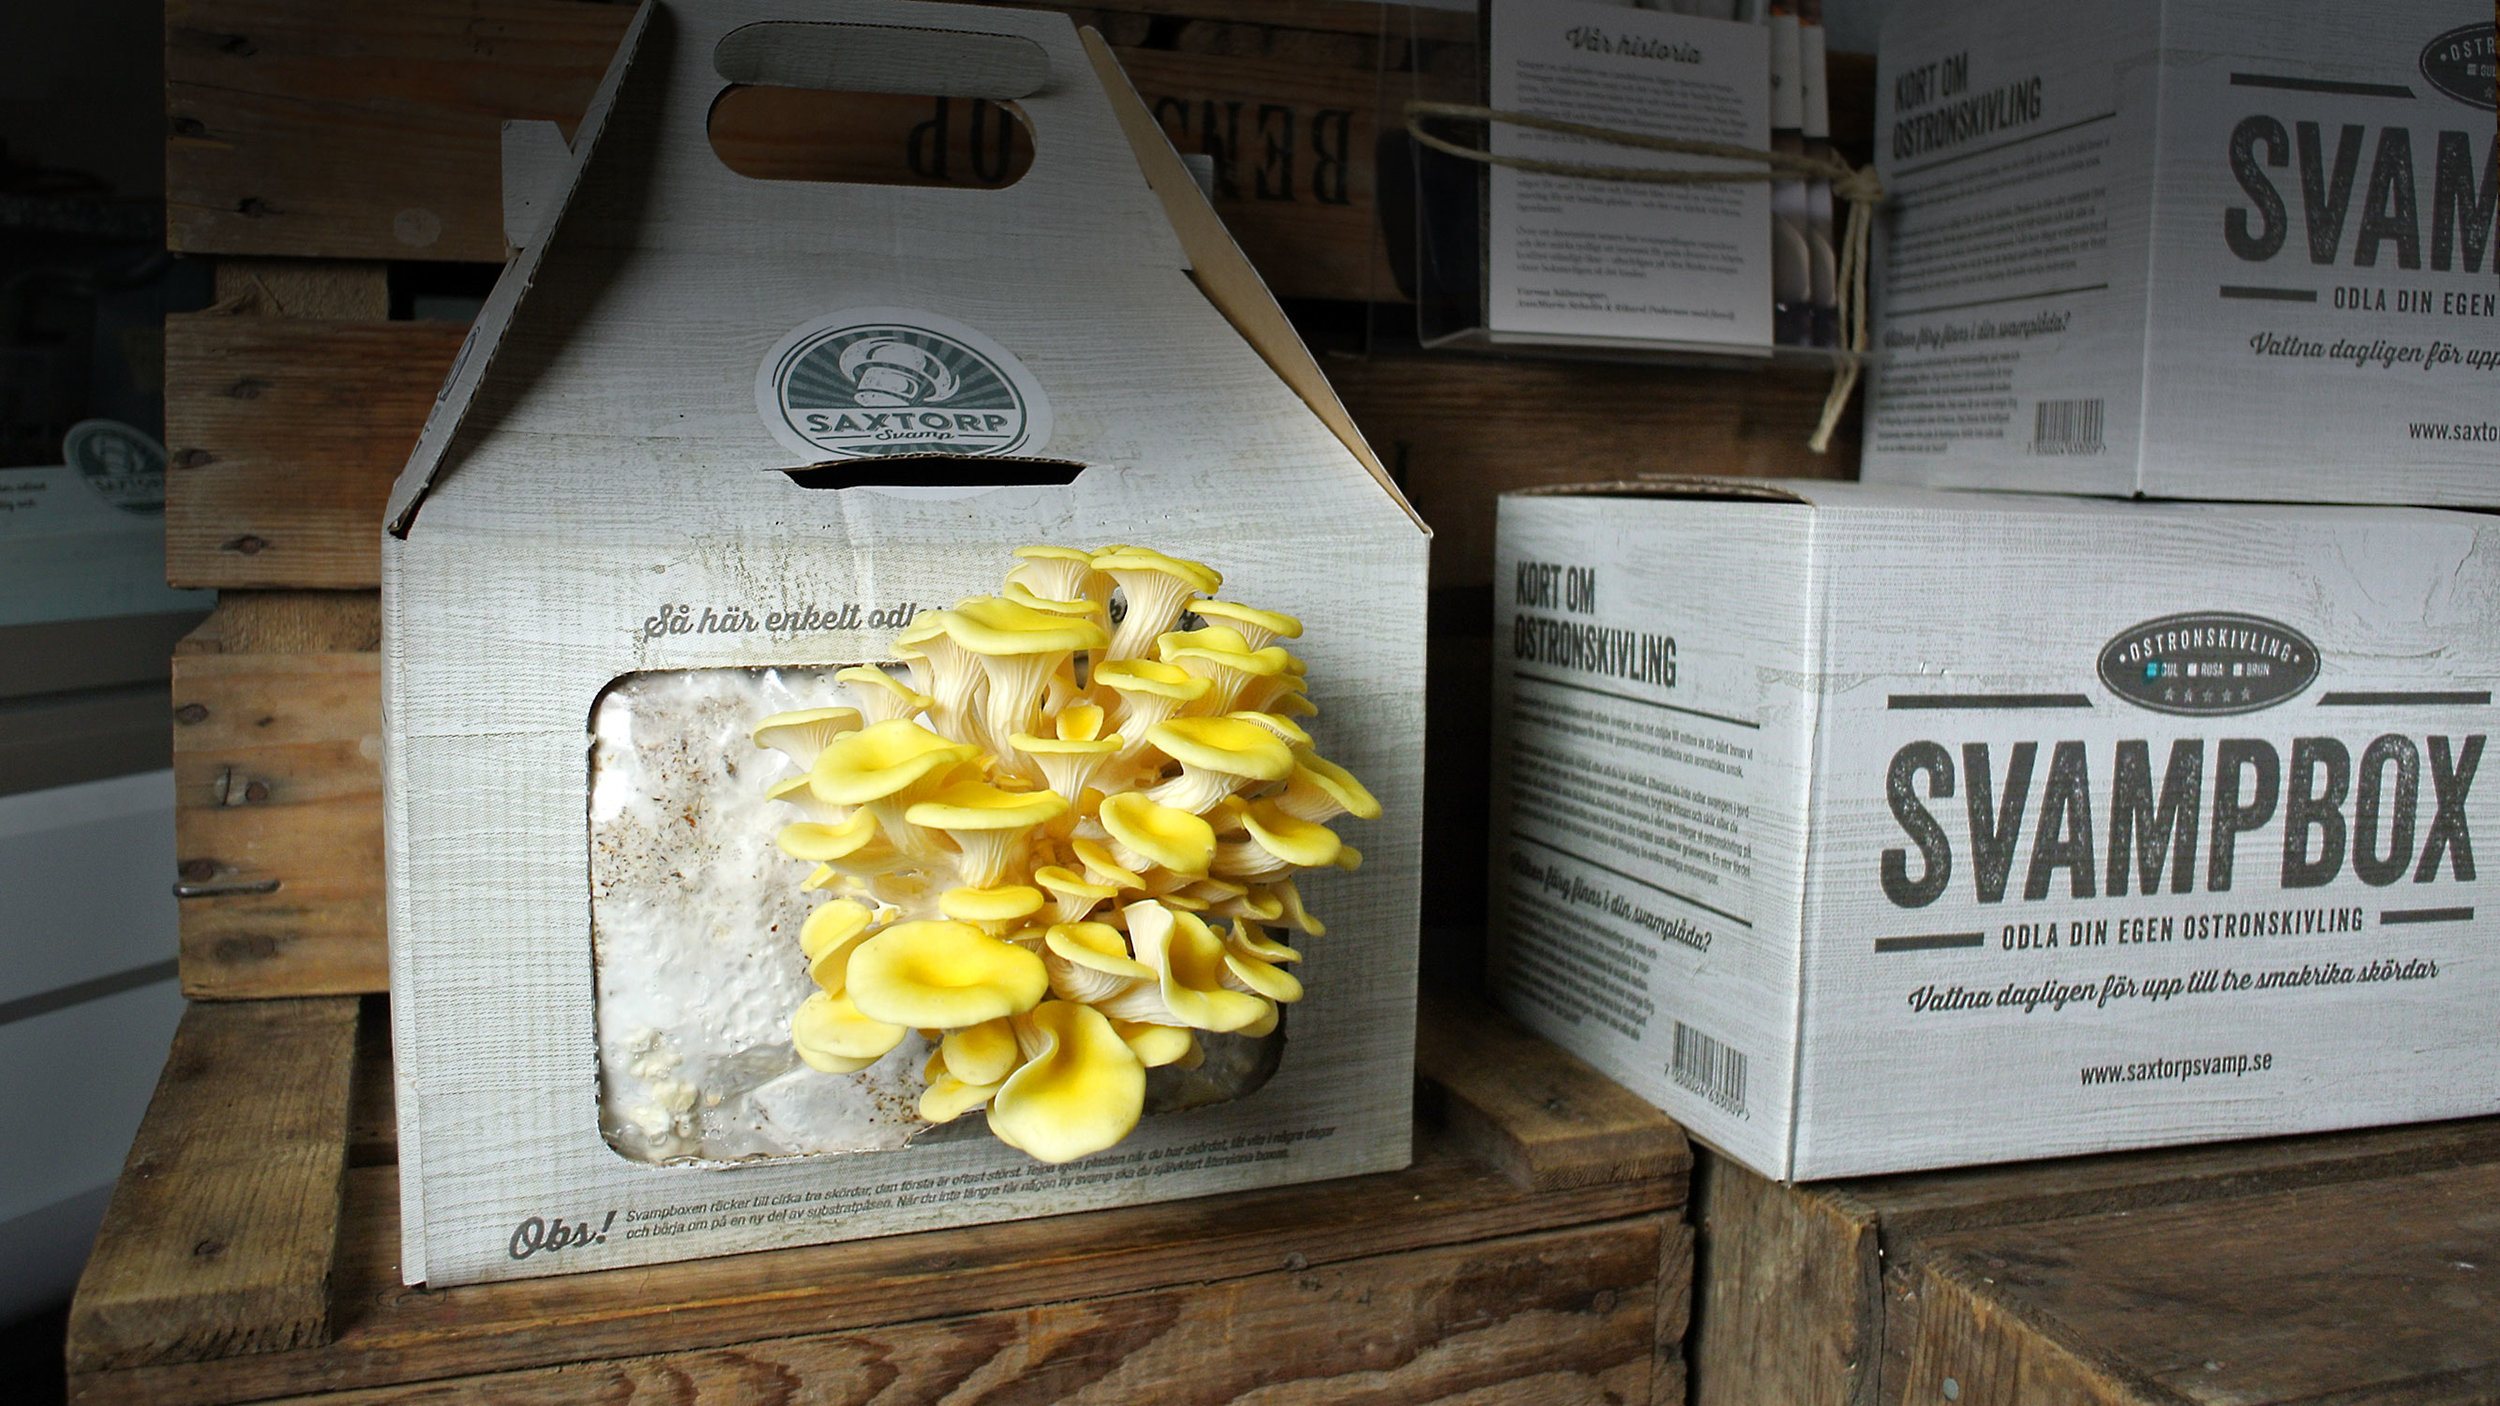 Gul ostronskivling i en svampbox från Saxtorp Svamp